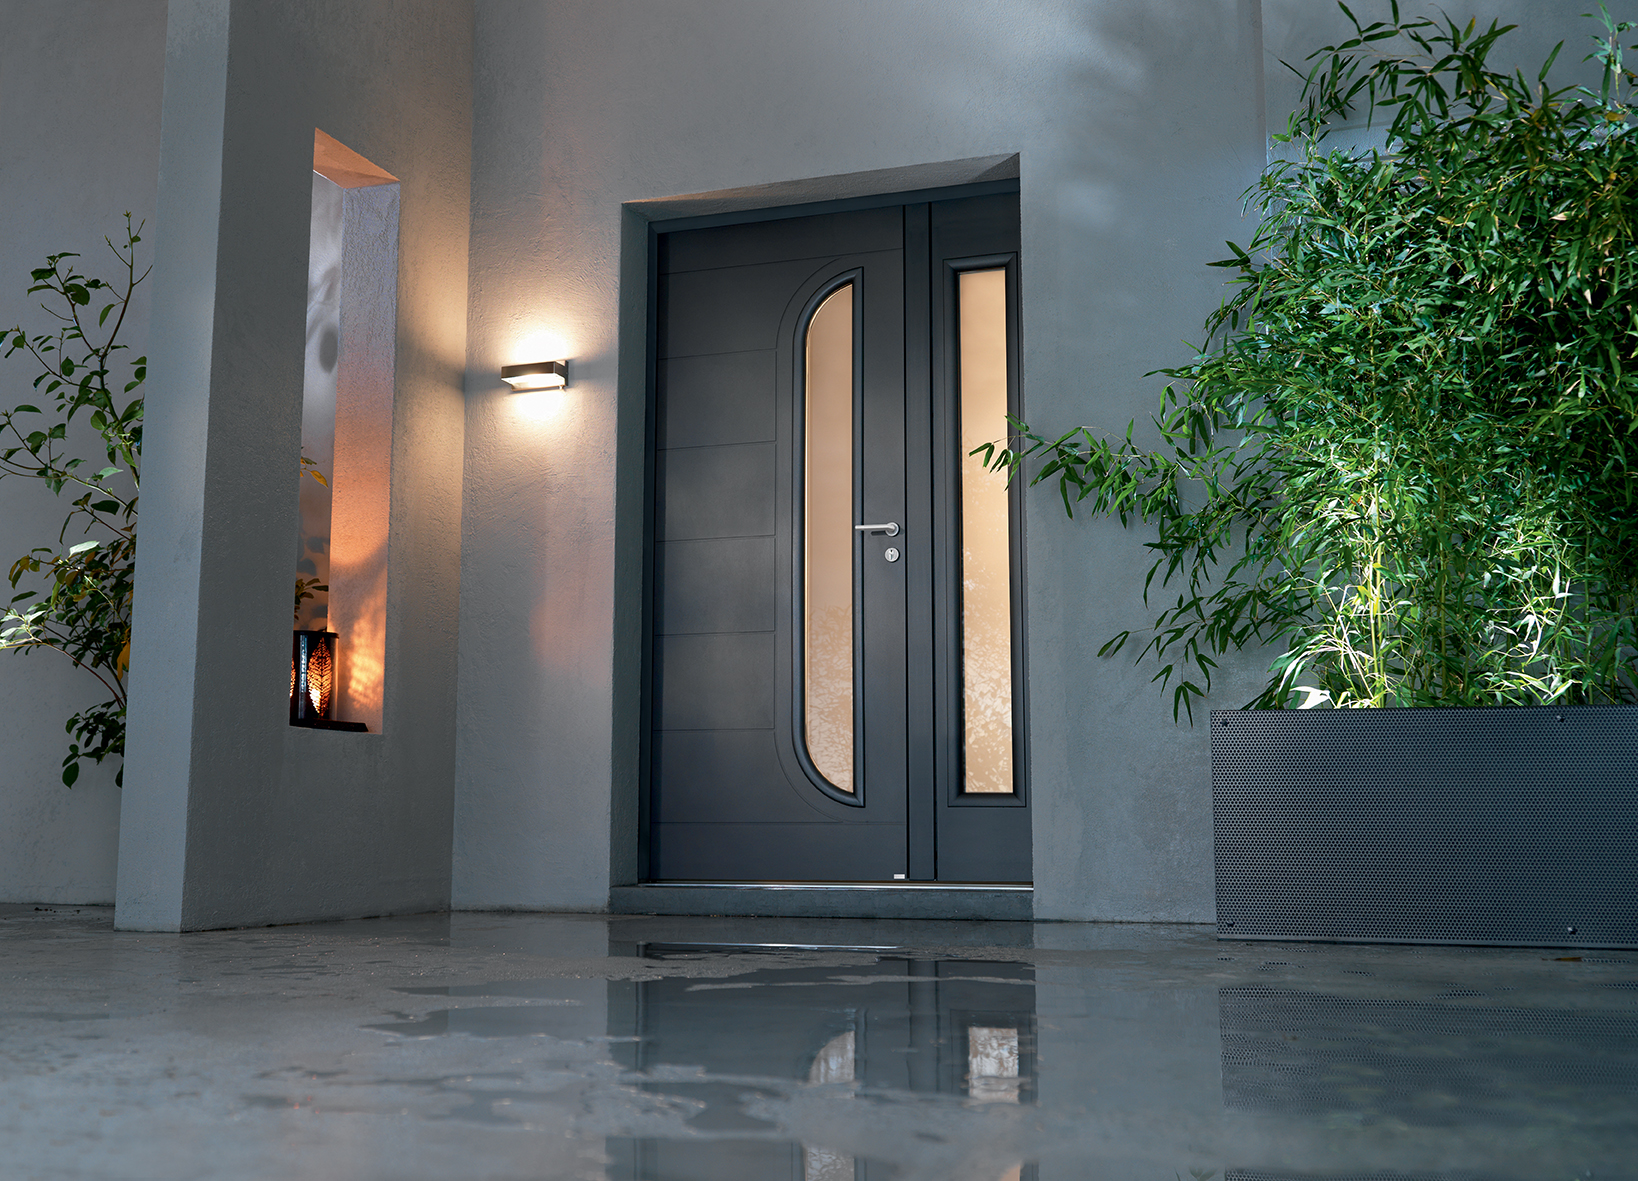 Porte d 39 entr e design bel 39 m blog deco design jo yana - Bel m porte d entree ...